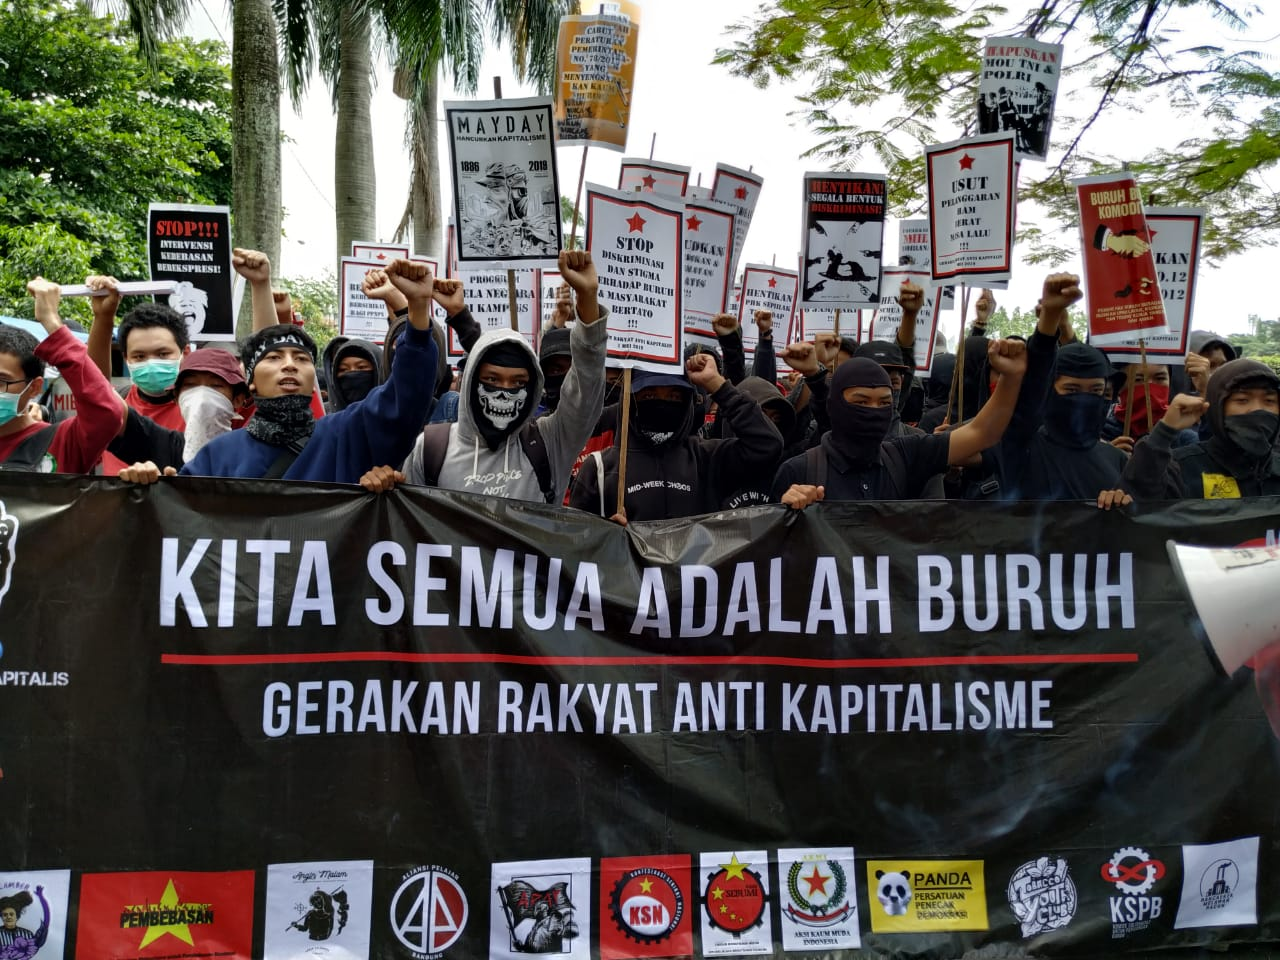 Pres Rilis : Koalisi Masyarakat SIPIL Kota Bandung Kecam Tindakan Aparat Keamanan  (Polri dan TNI) dalam Aksi May Day Bandung 2019